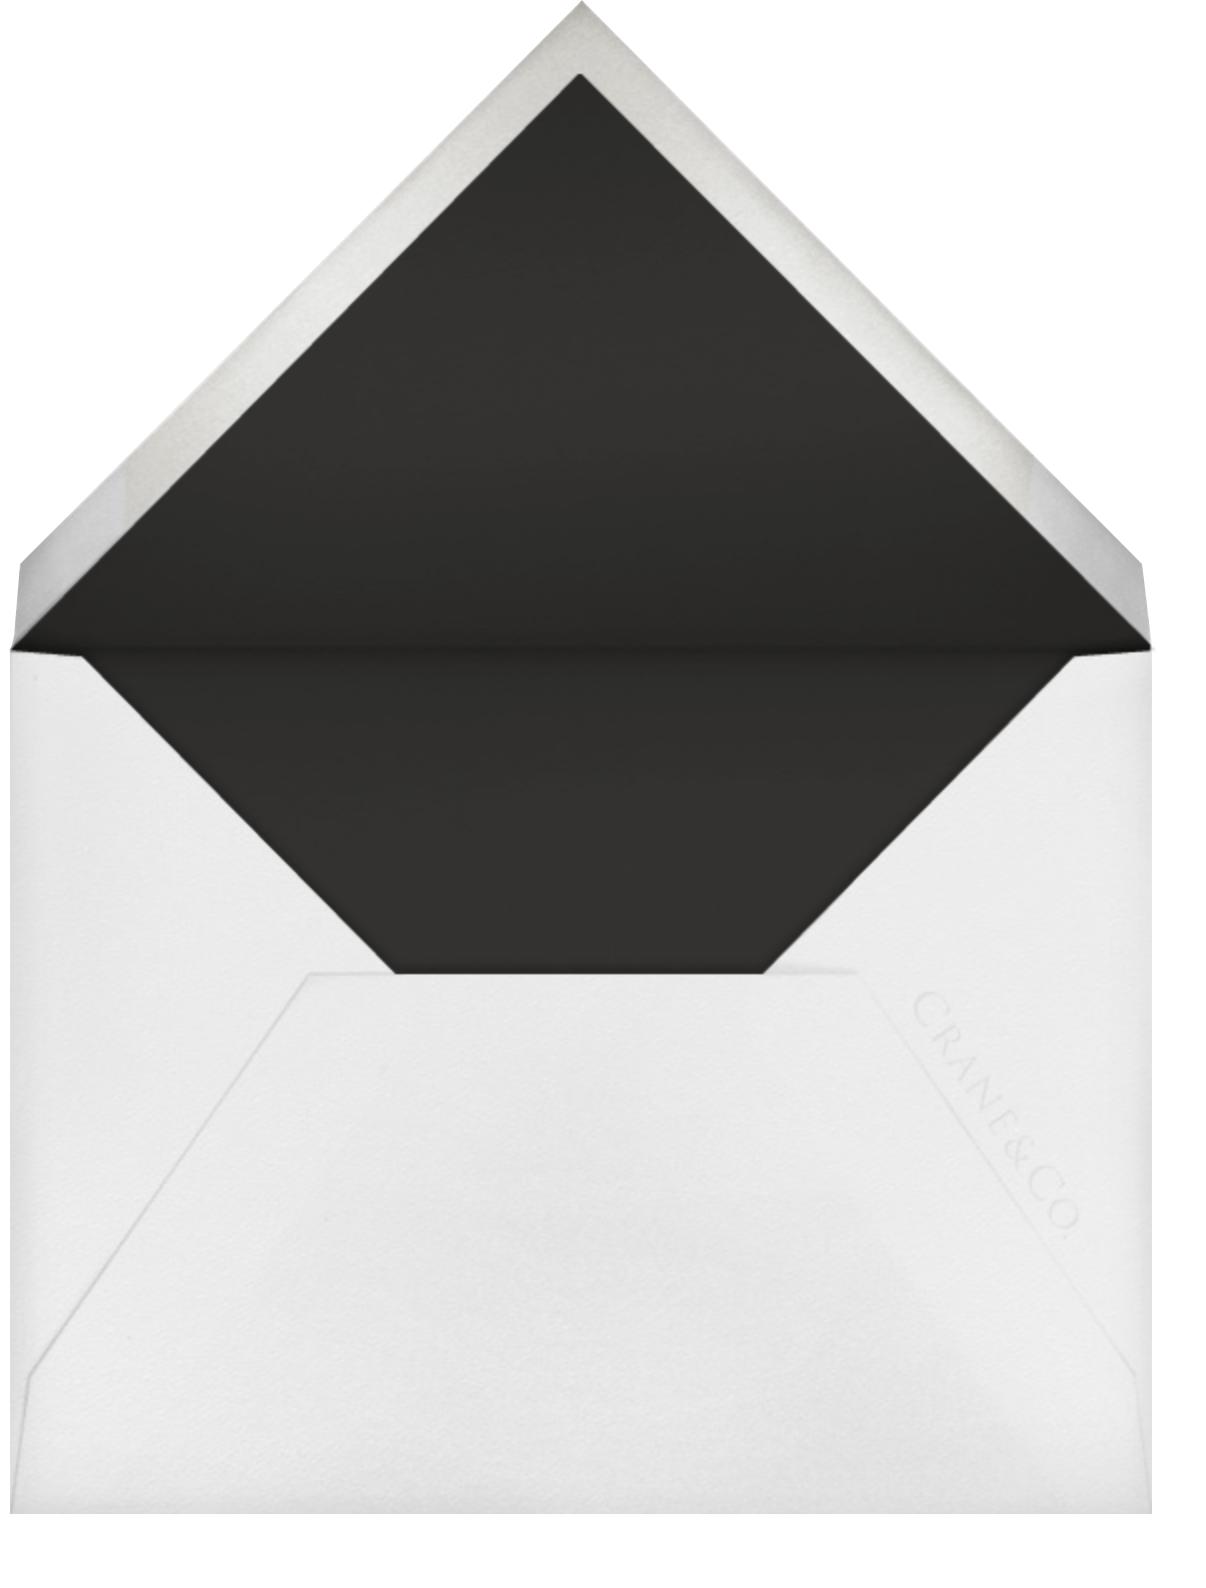 Antique Lace (Thank You) - Black - Oscar de la Renta - Personalized stationery - envelope back